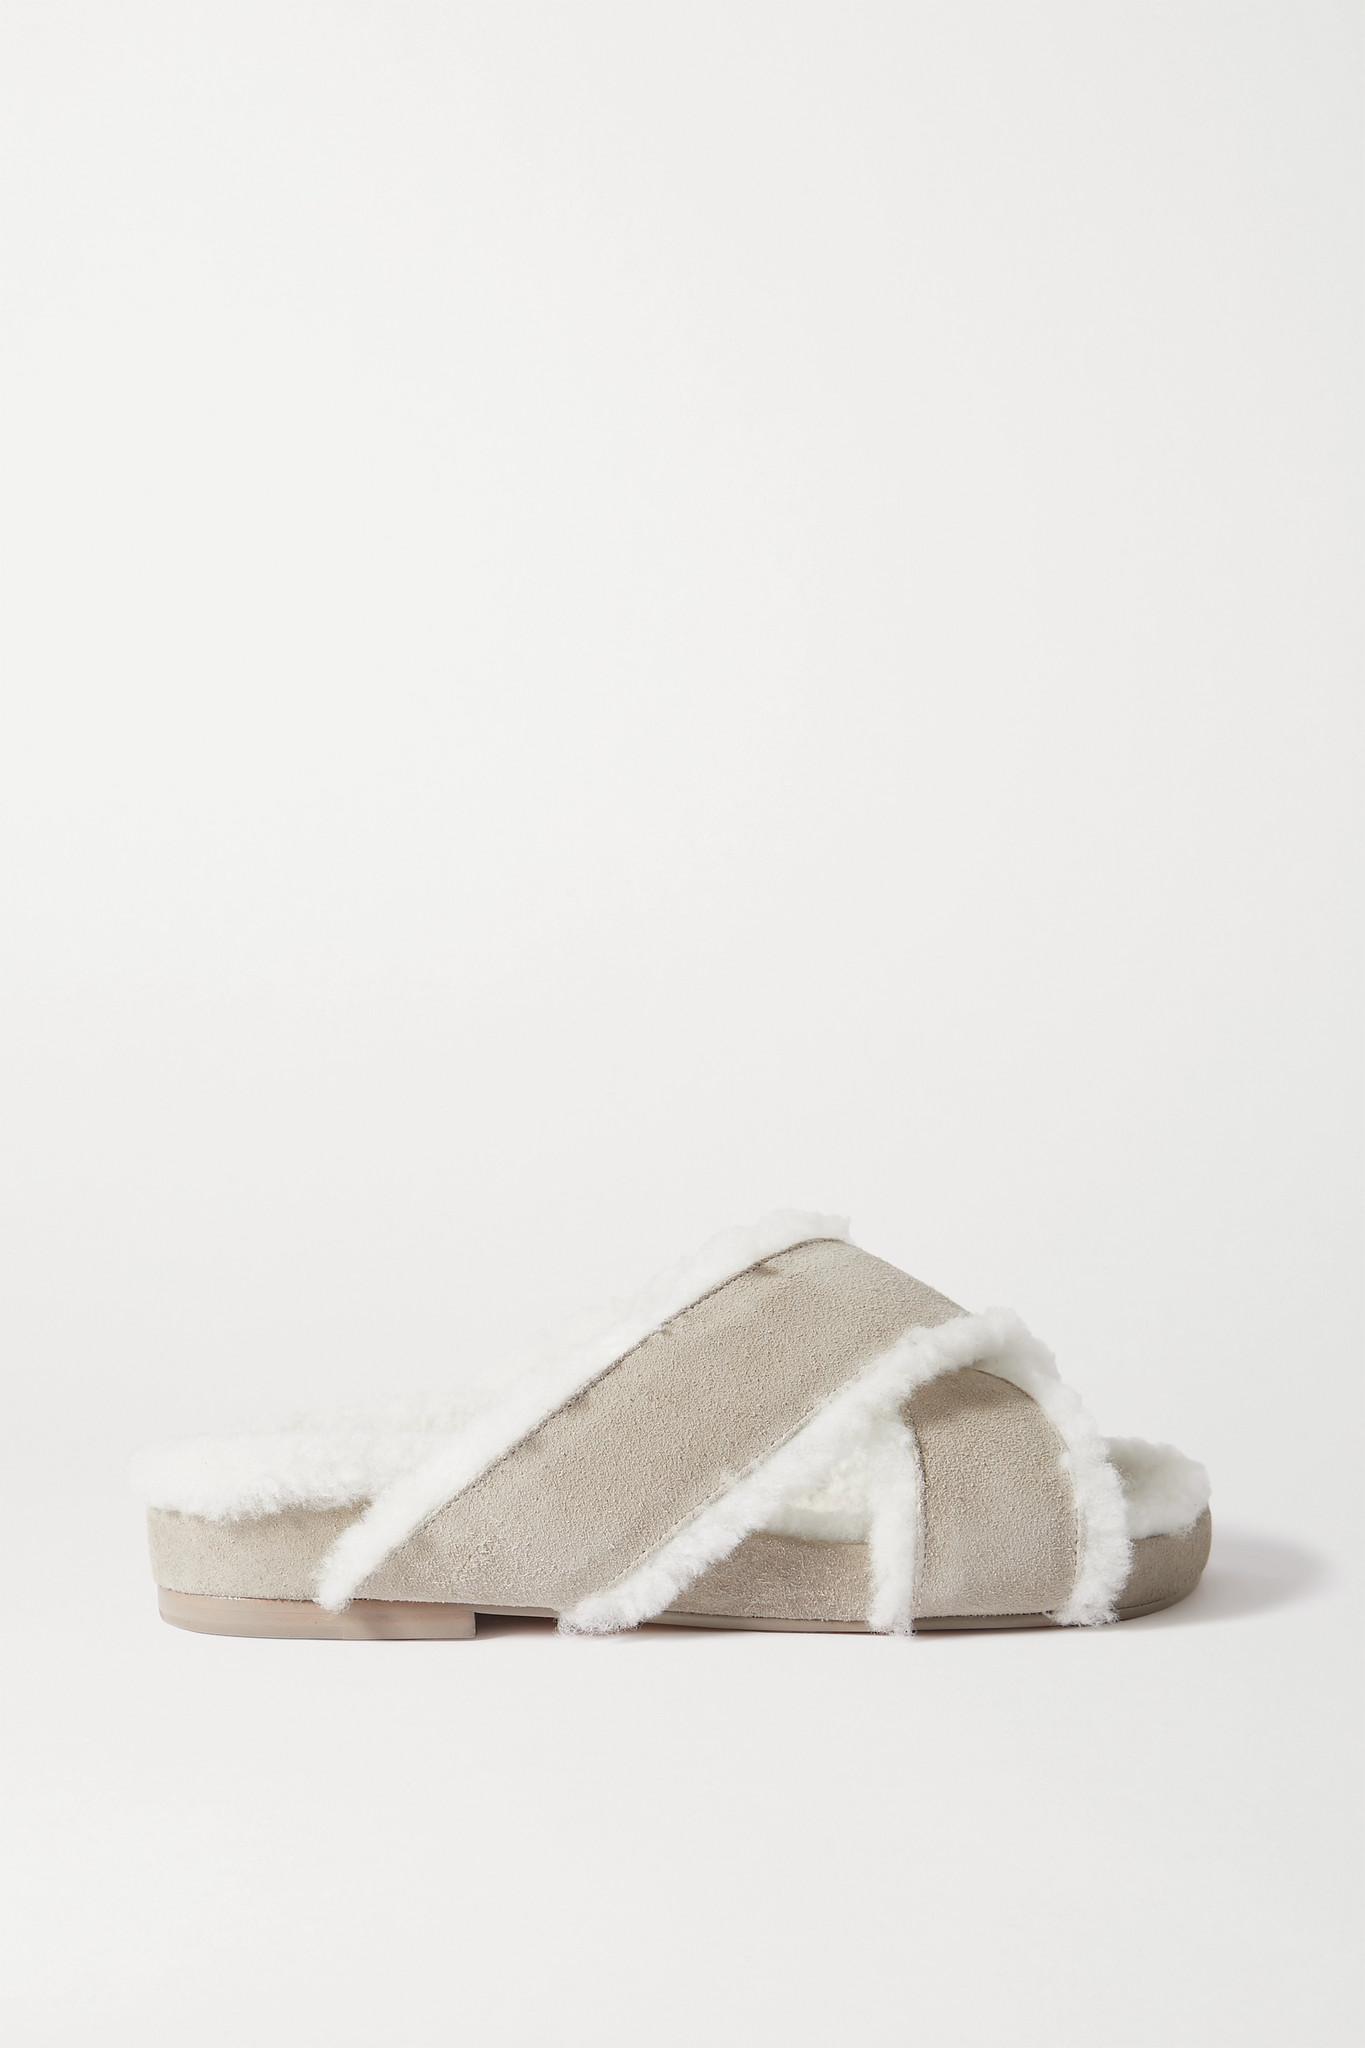 PORTE & PAIRE - 羊毛皮衬里绒面革拖鞋 - 灰色 - IT40